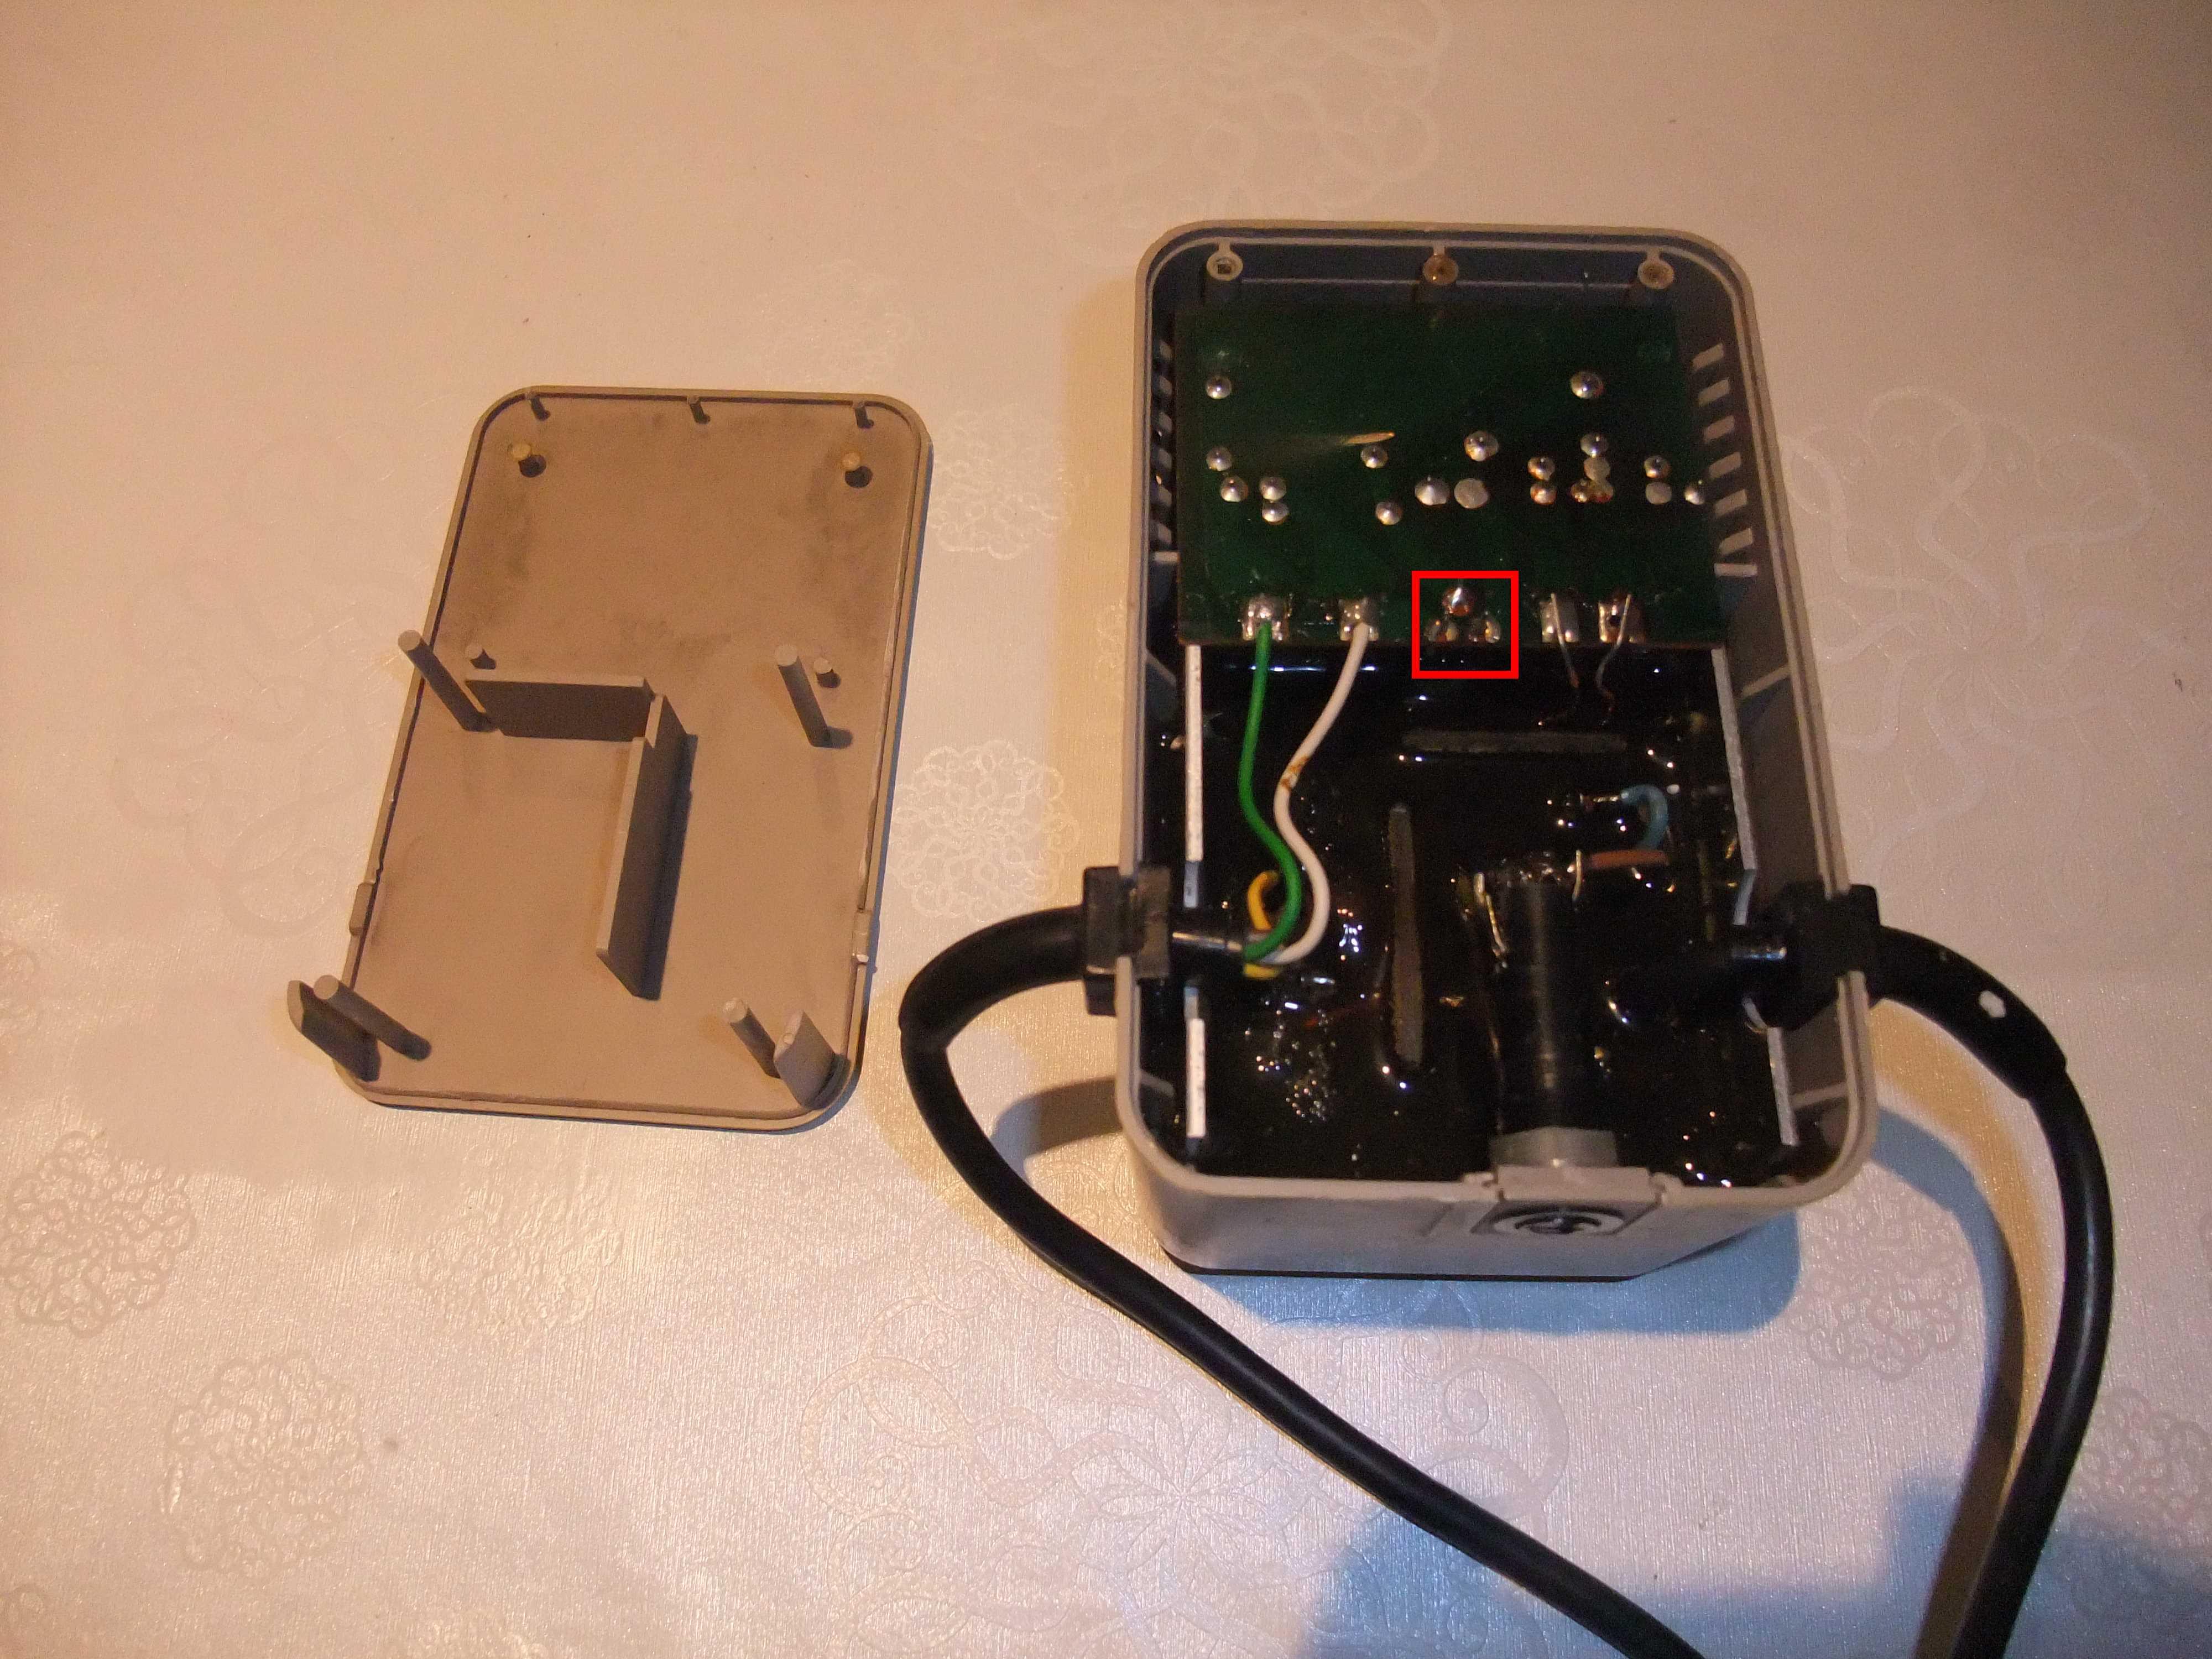 DSCF9060_square